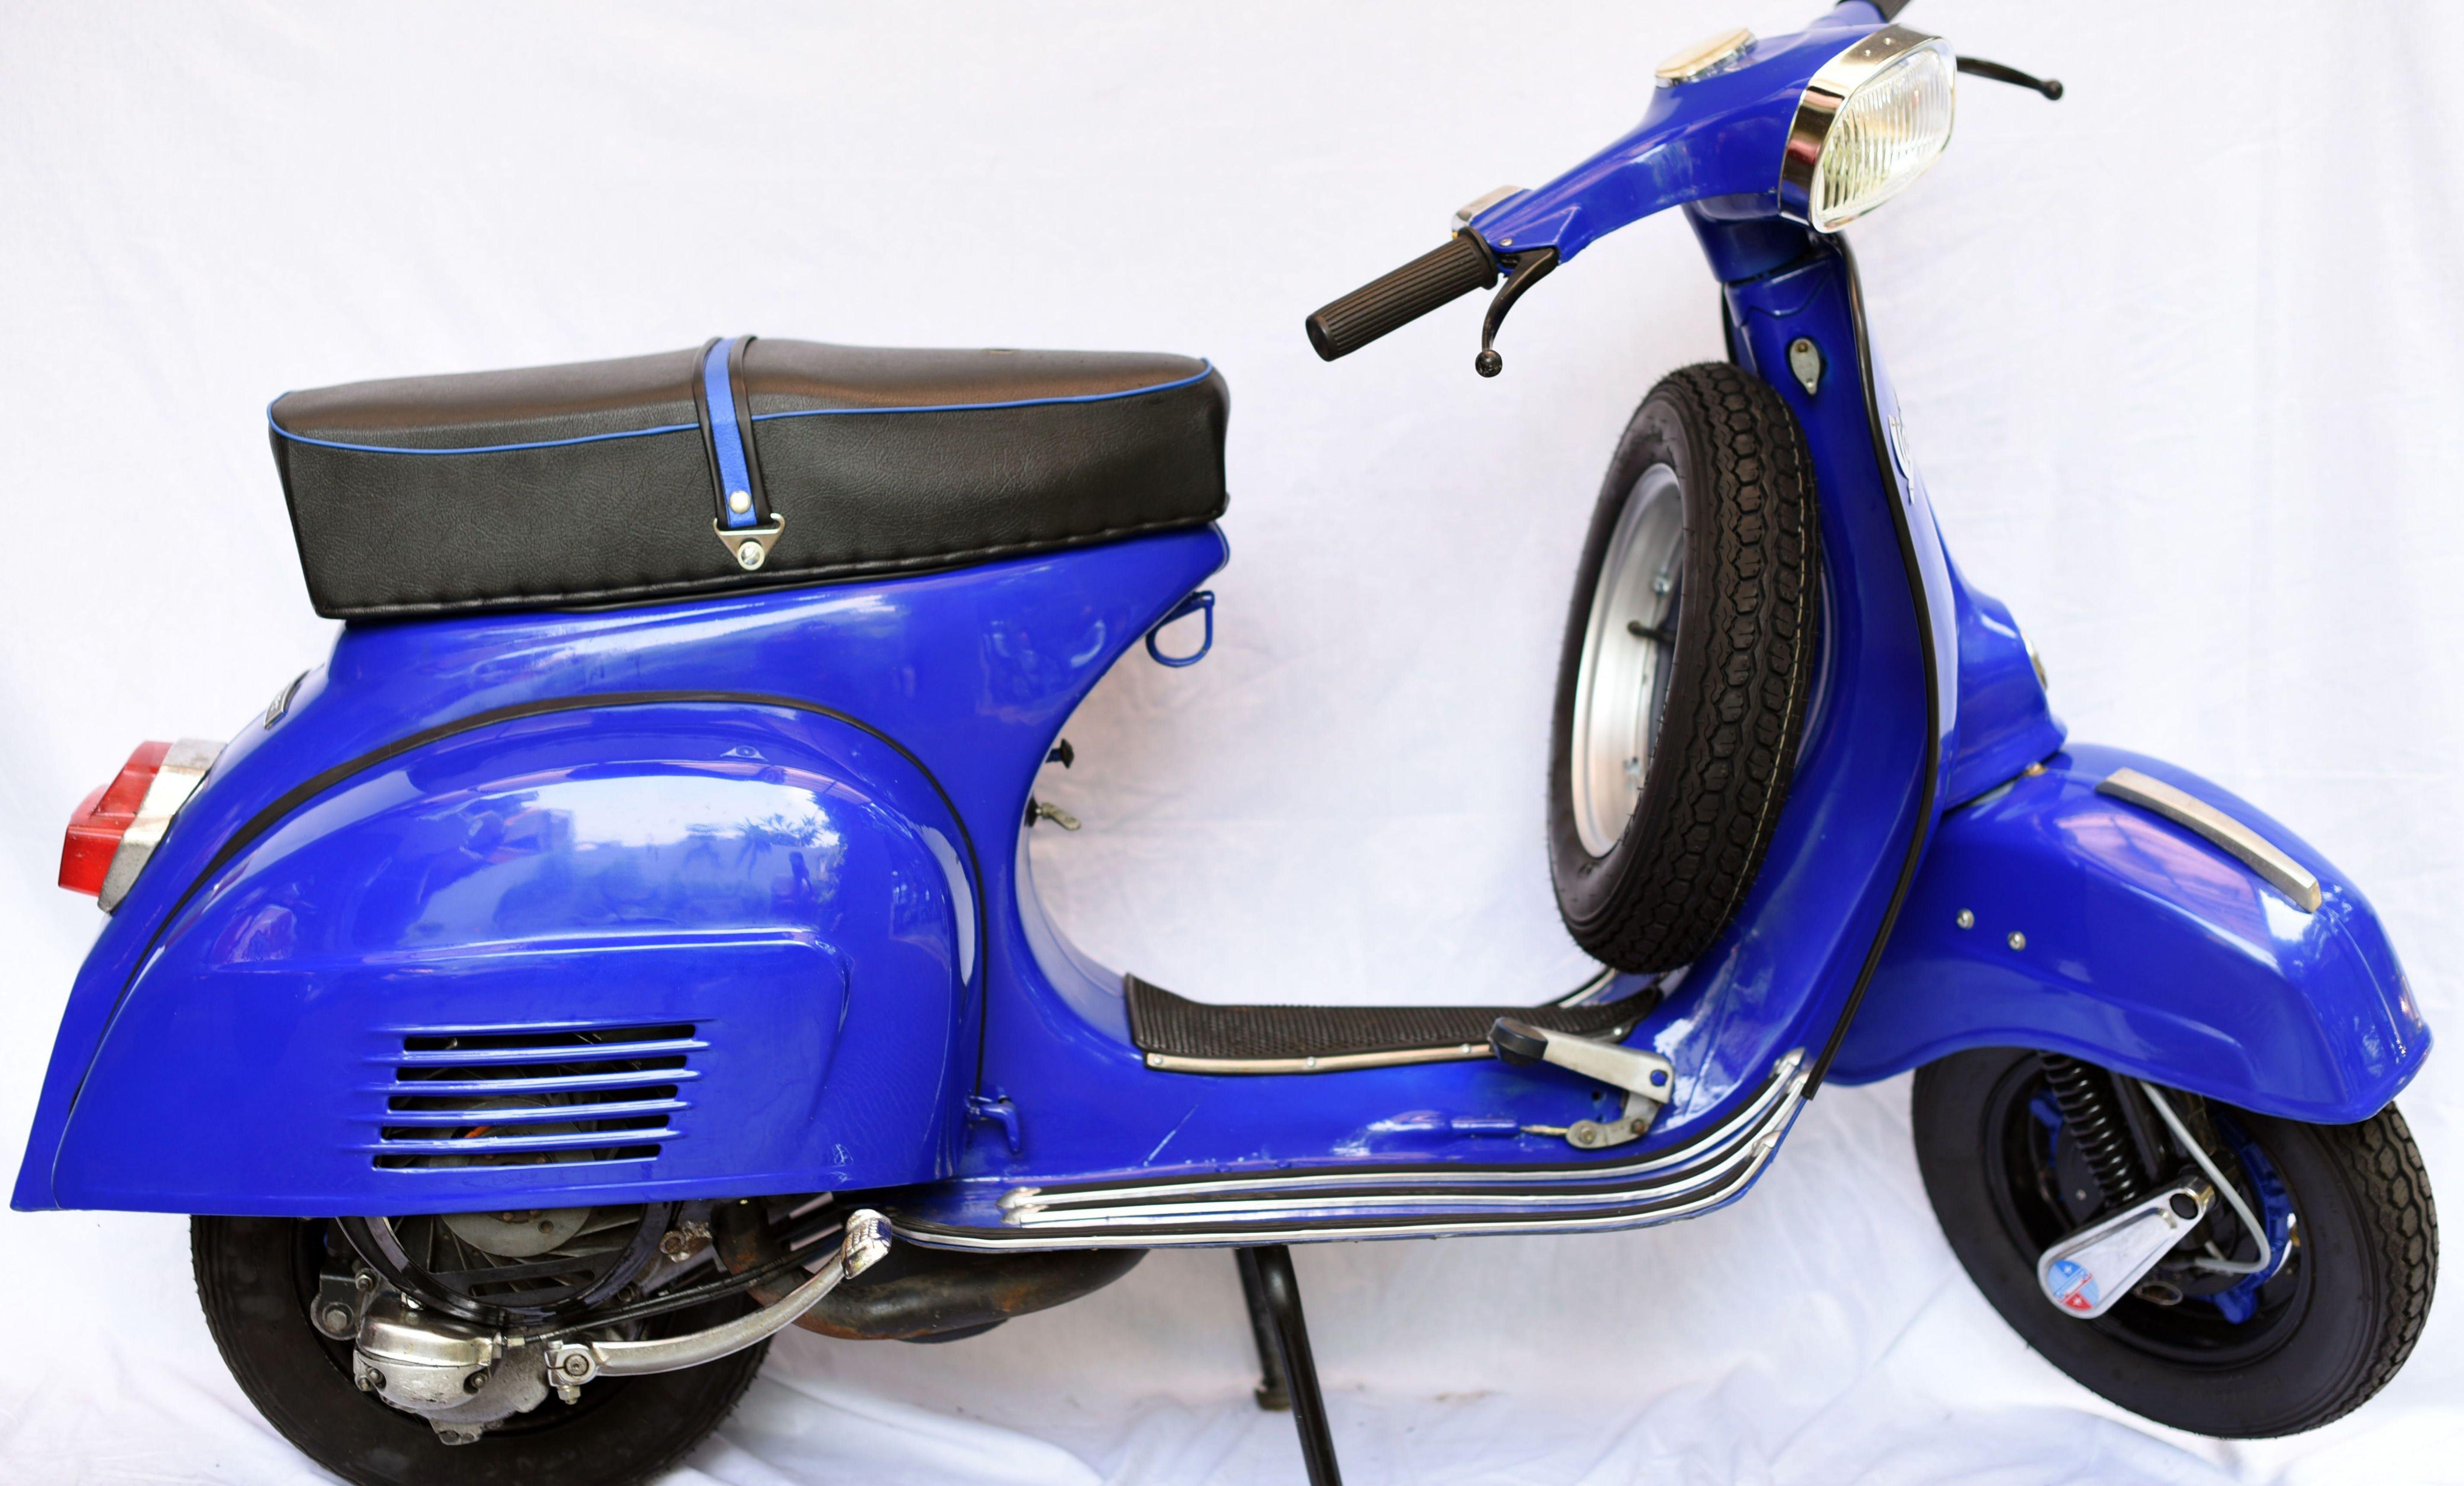 2 1976 Blue Purple Vespa Super 150 Worldwide Vintage Vehicles